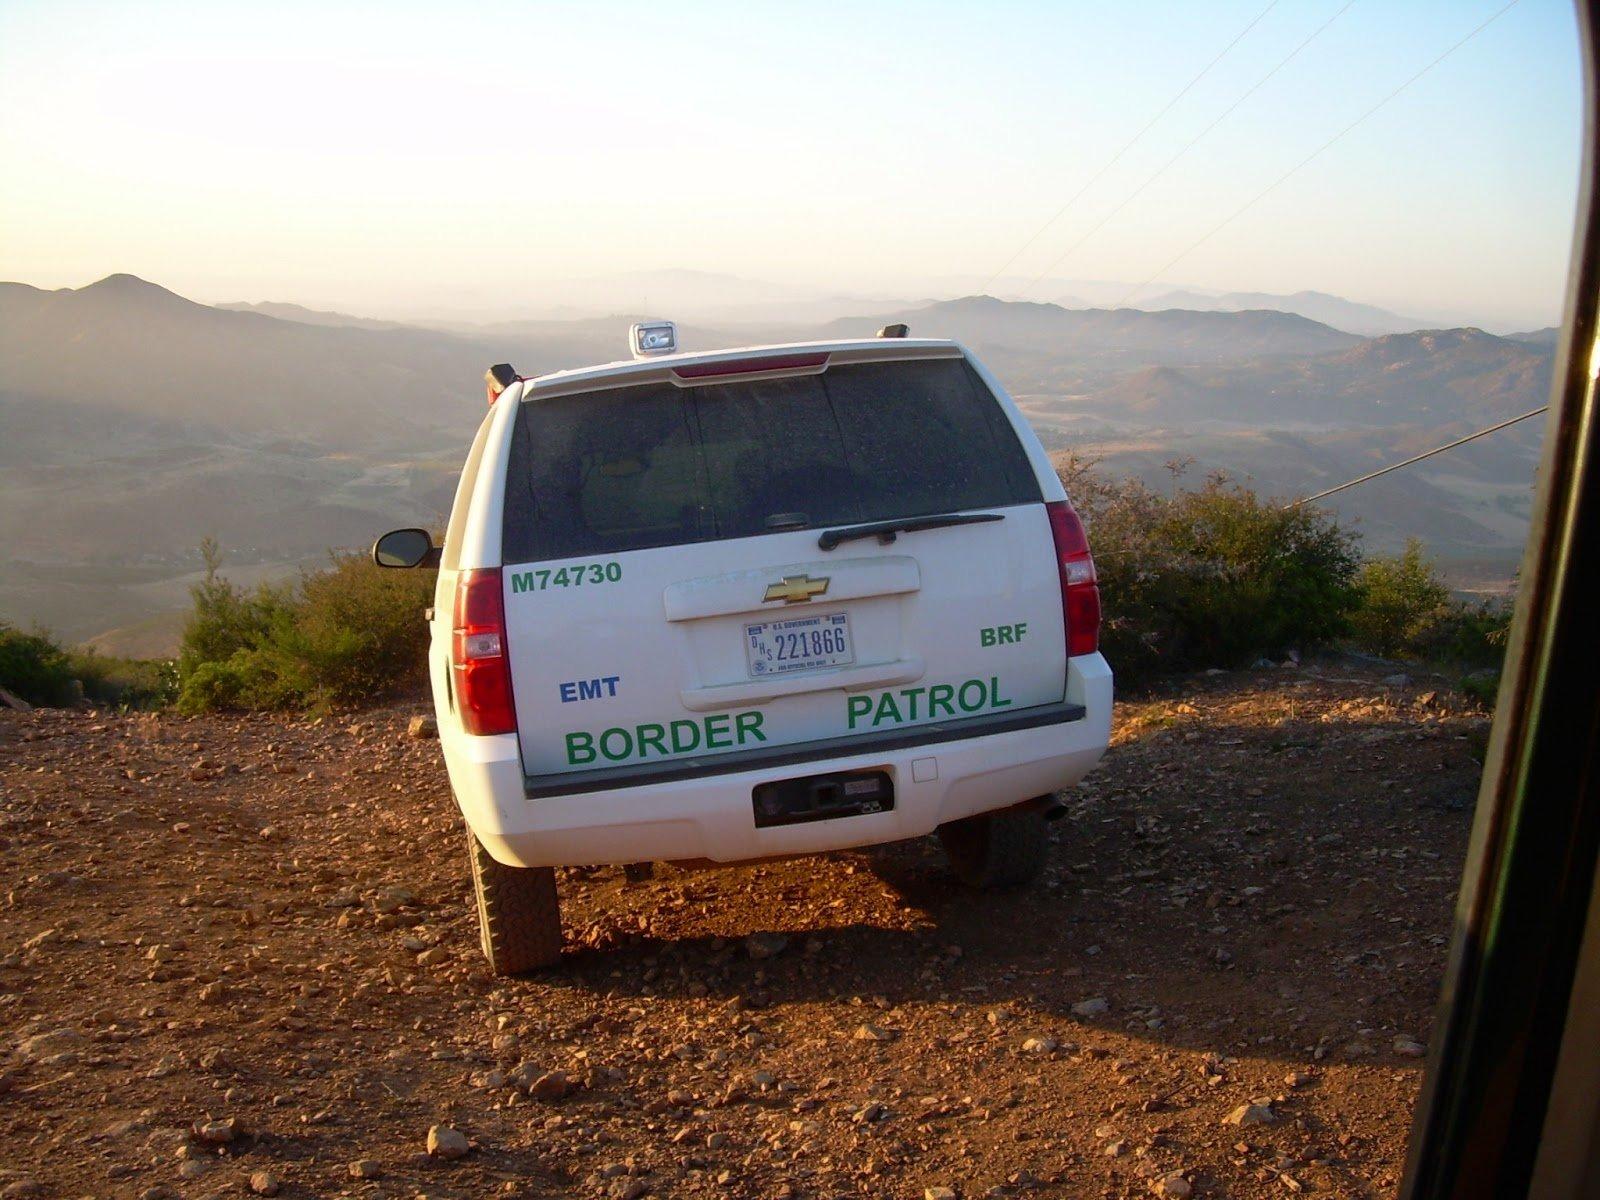 Border Patrol accident with civilian